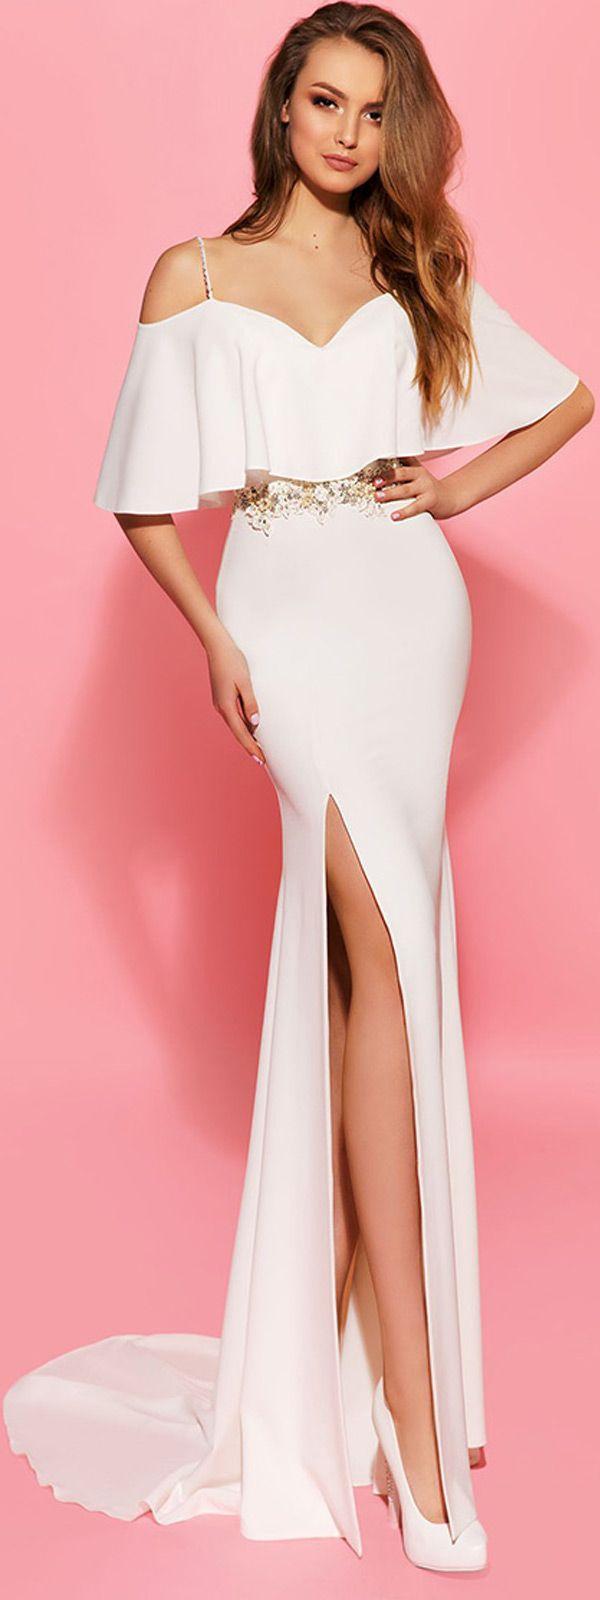 Amazing Acetate Satin Spaghetti Straps Sheath Wedding Dresses With ...